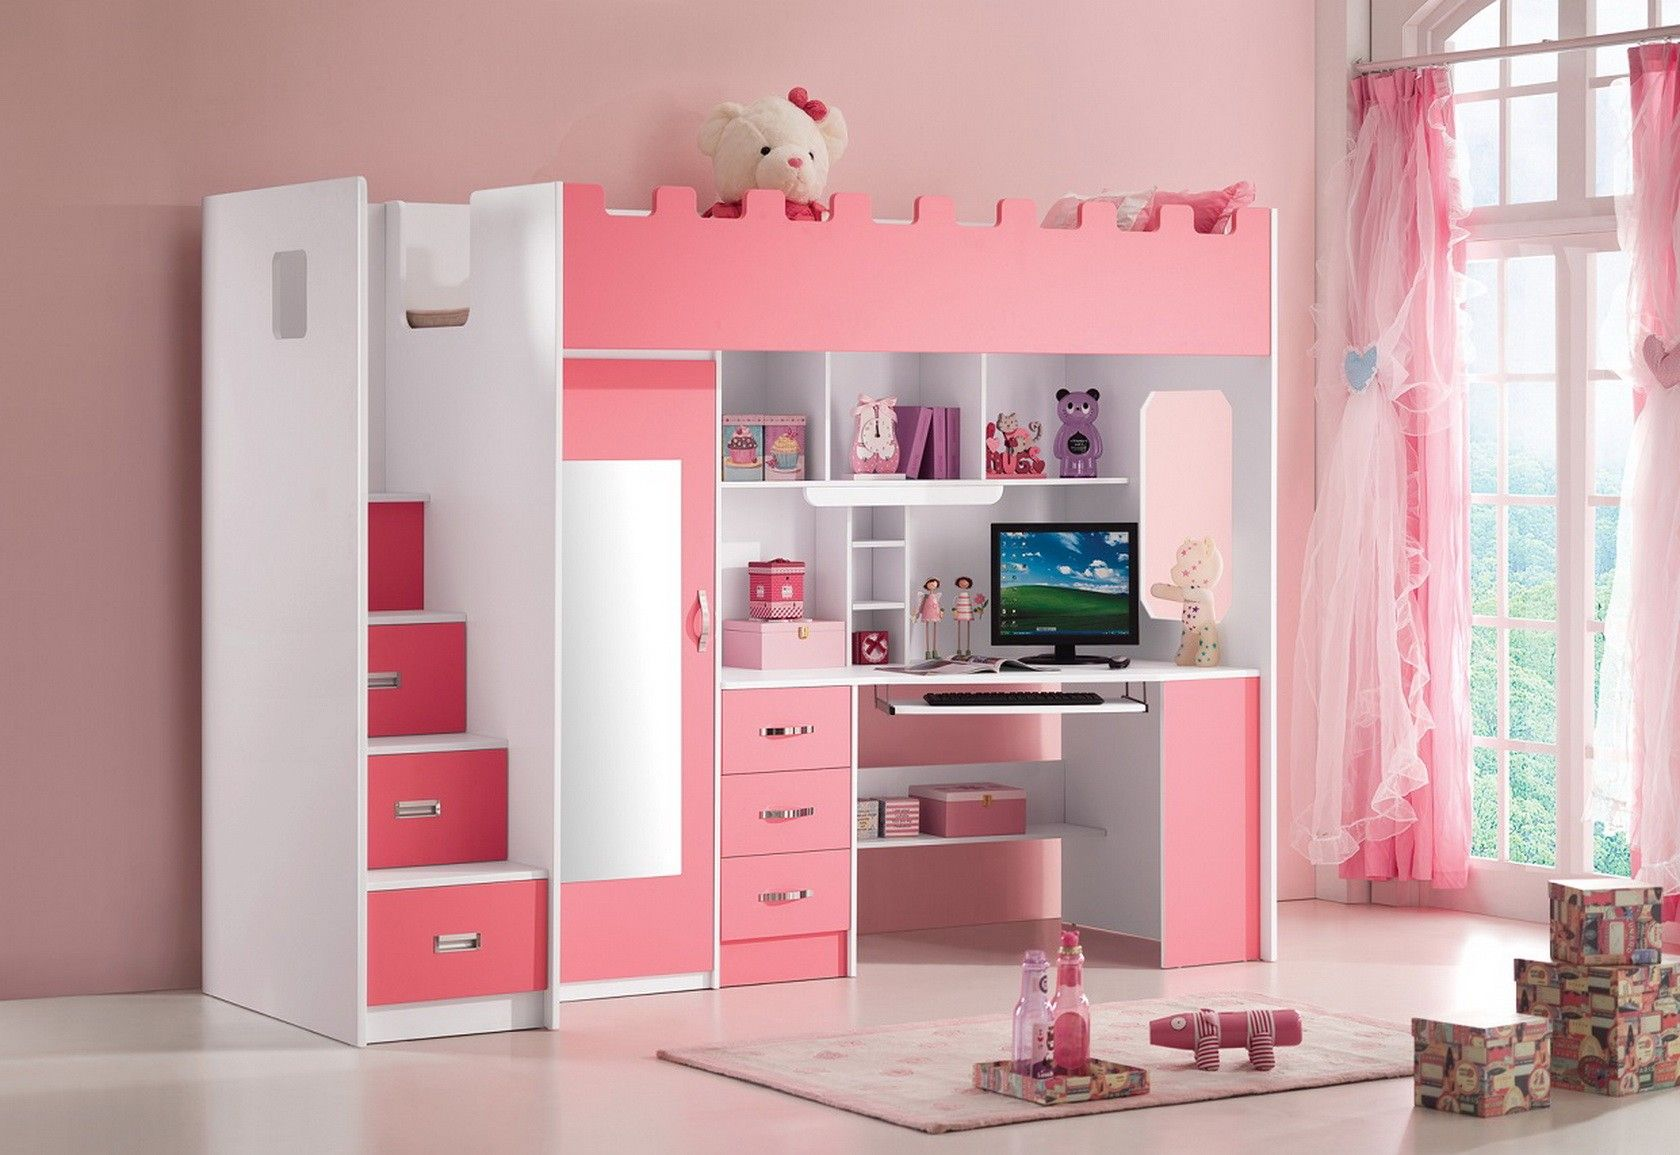 Lit Combine Mezzanine Coloris Rose Et Blanc Decoracion De